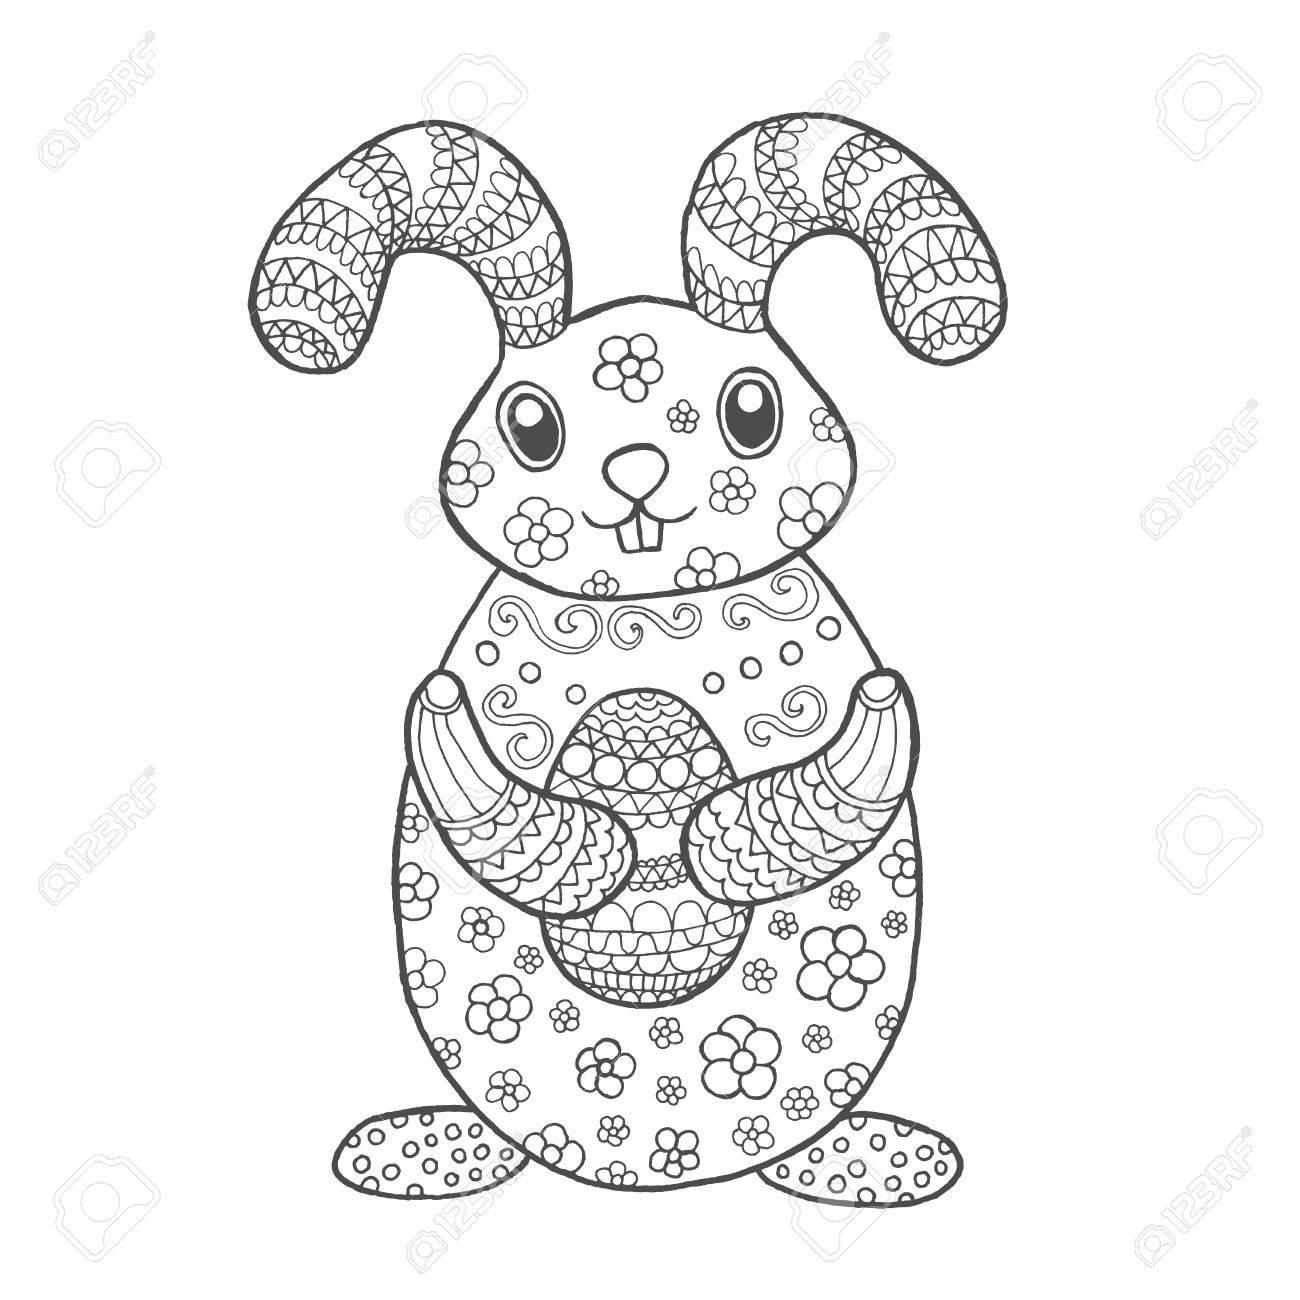 Lindo Conejo De Pascua. Animales Whitedoodle Negro. Ilustración ...